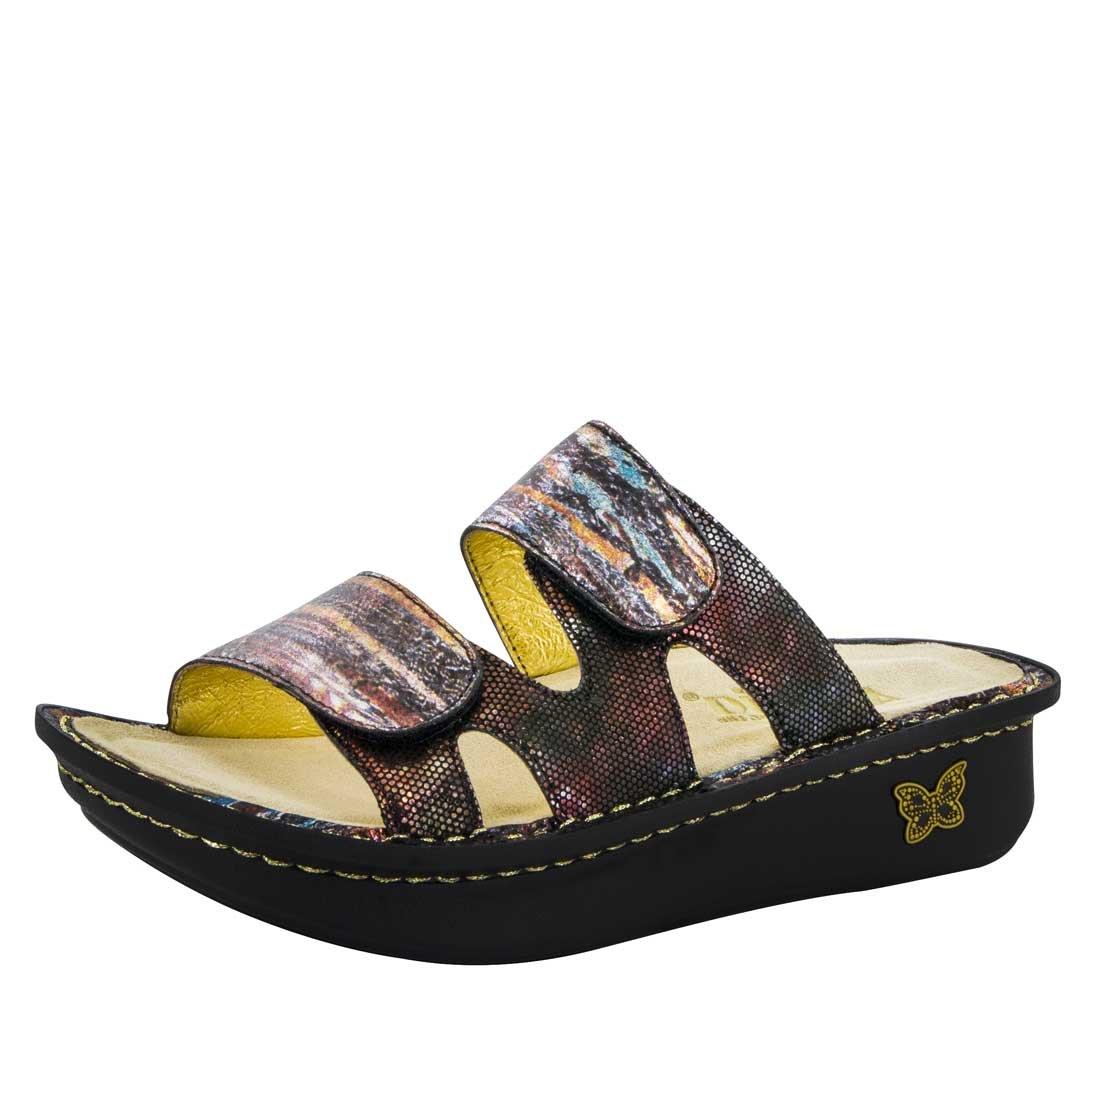 Alegria Women's Cami Boot B01IO28K2U 38 M EU / 8-8.5 B(M) US|Earthen